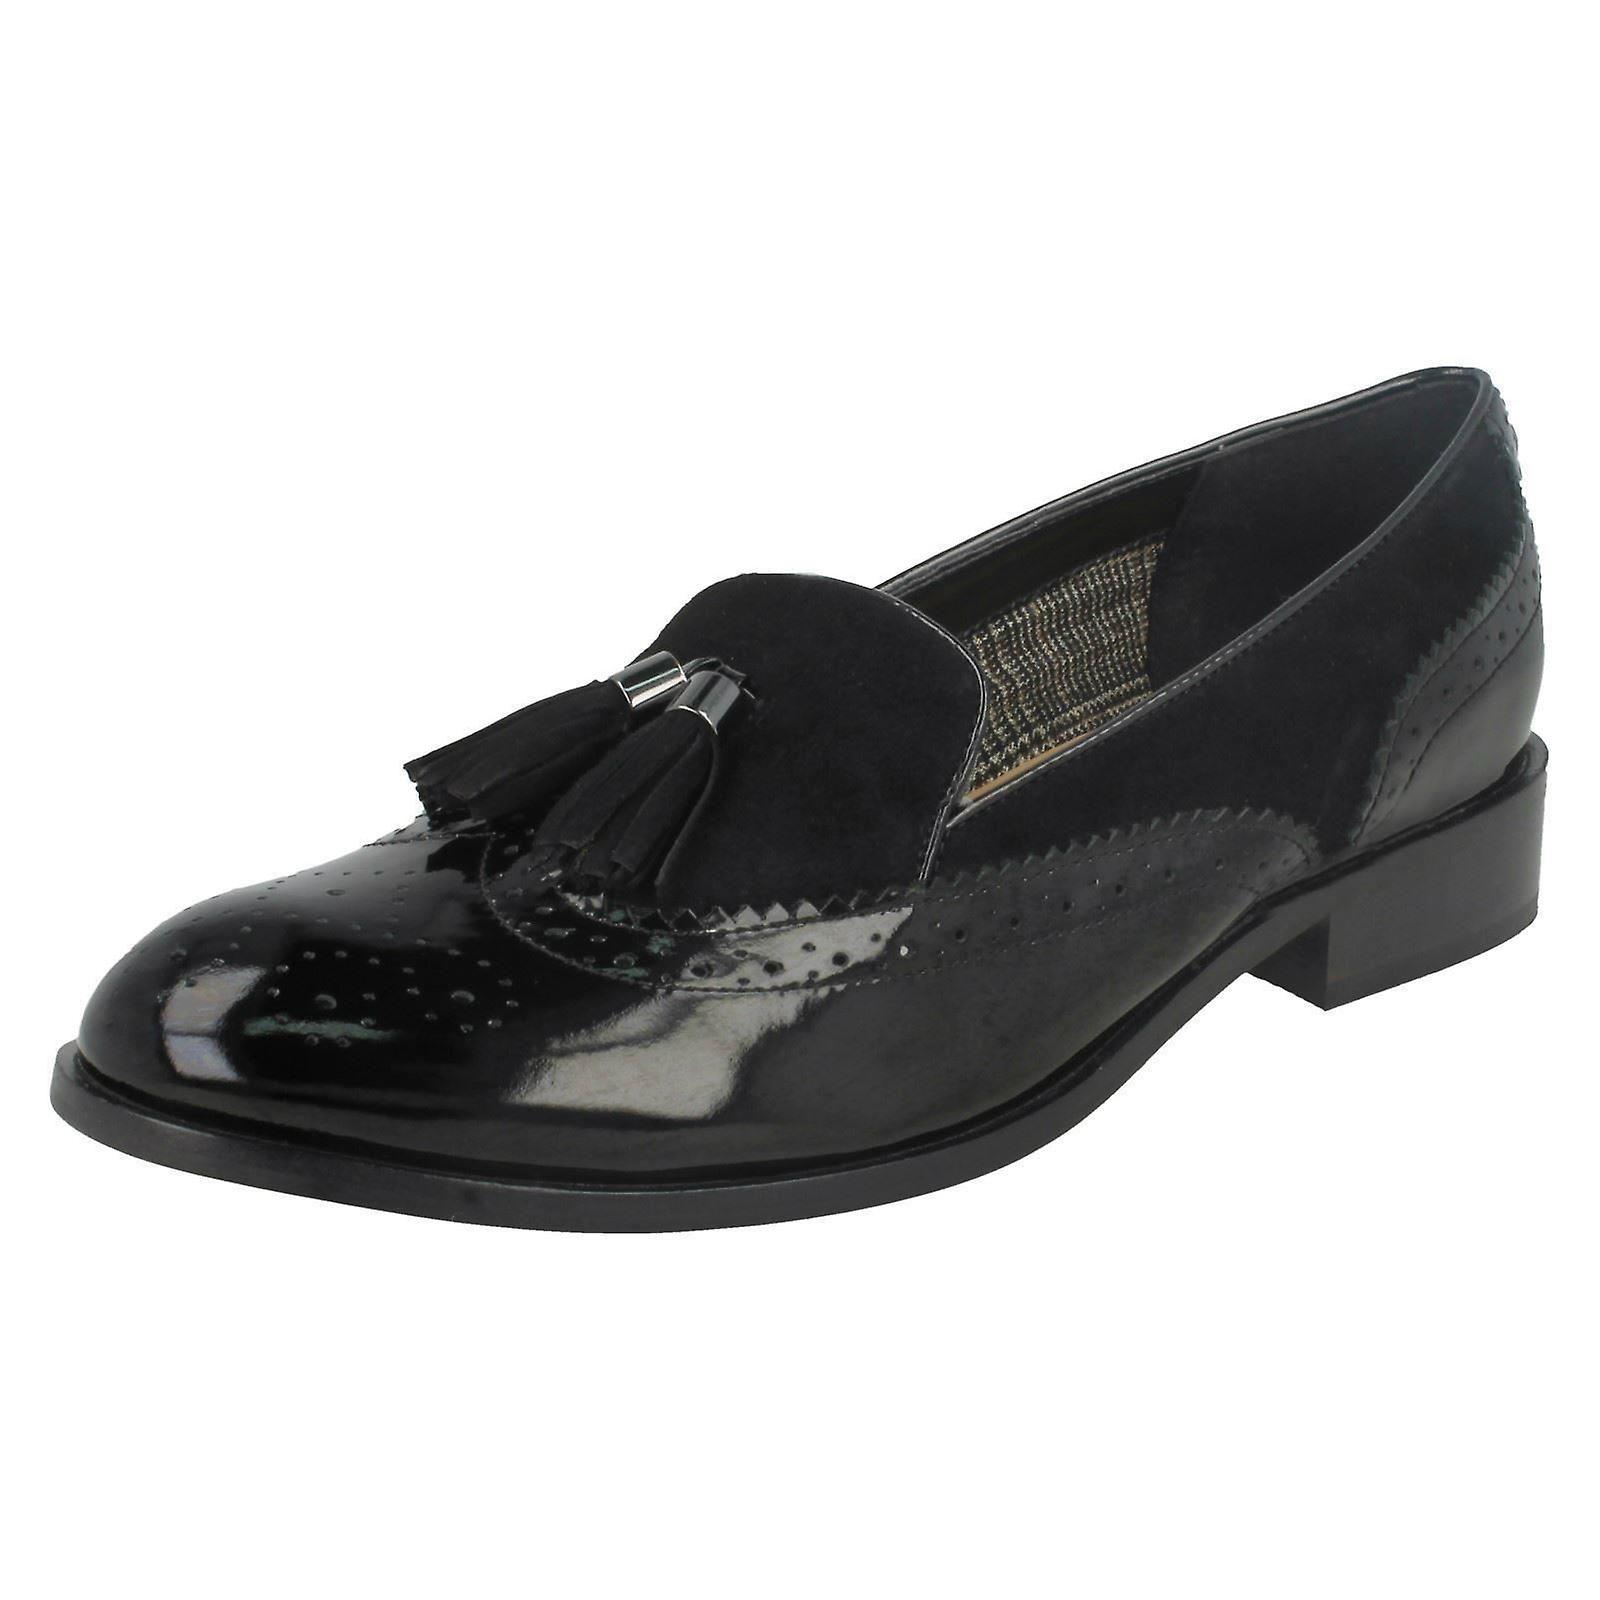 Le signore Van Dal mocassino scarpe basse Buchanan